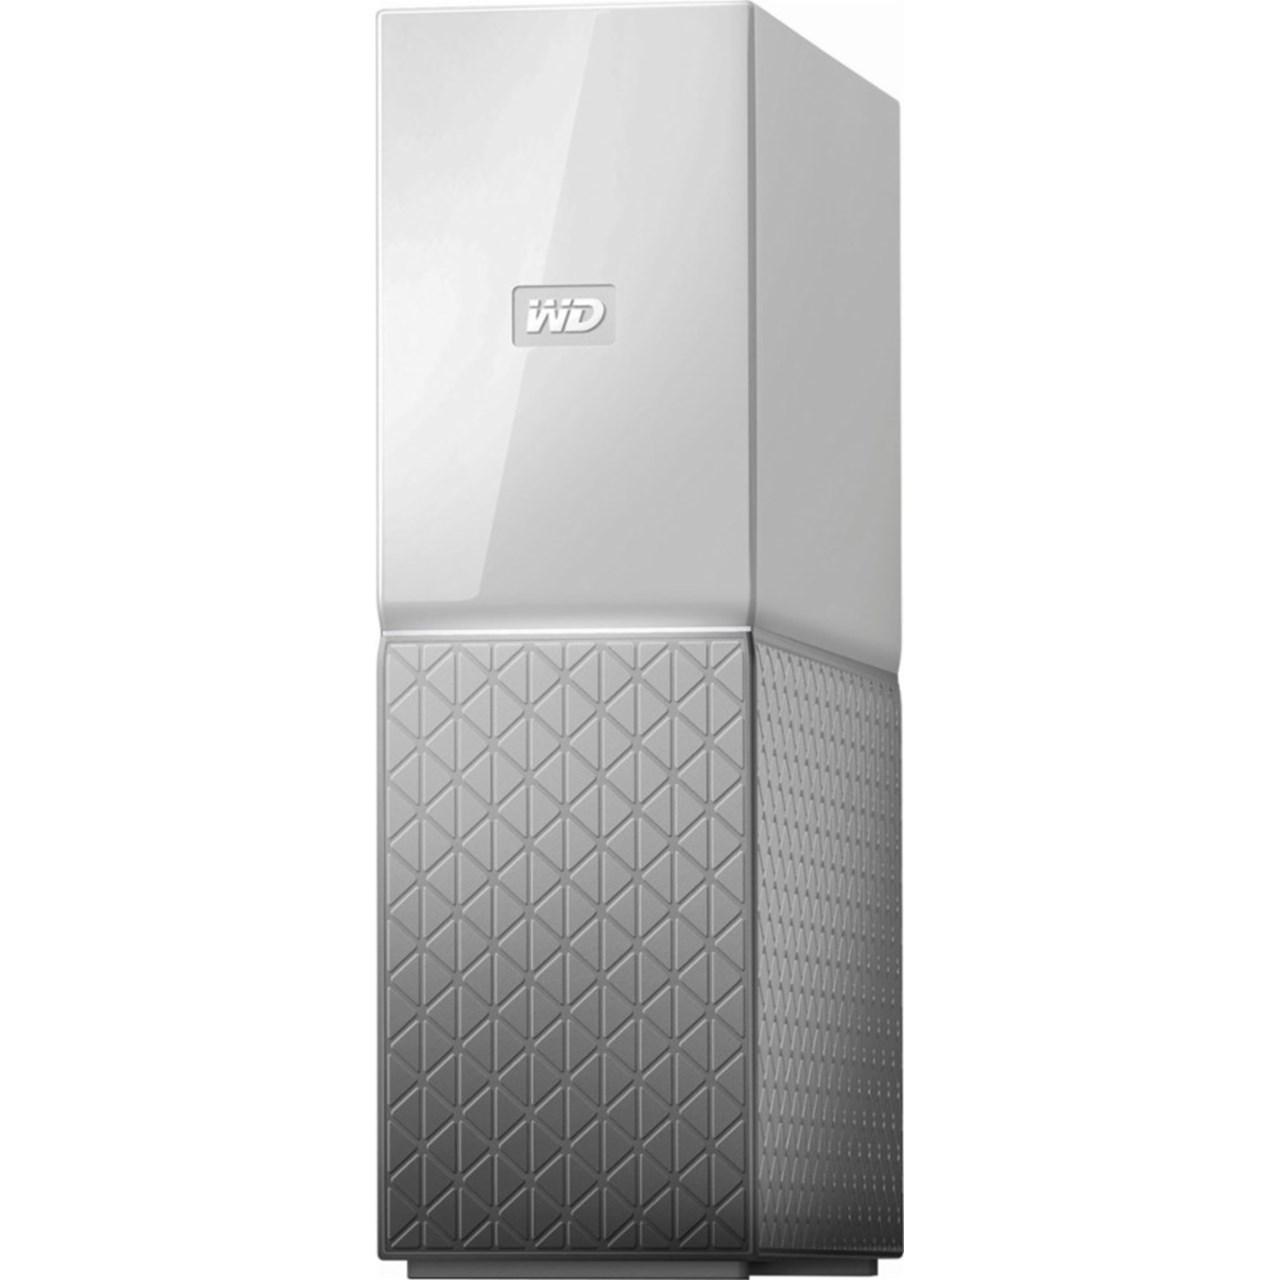 ذخیره ساز تحت شبکه وسترن دیجیتال مدل My Cloud Home WDBVXC0030HWT ظرفیت 3 ترابایت